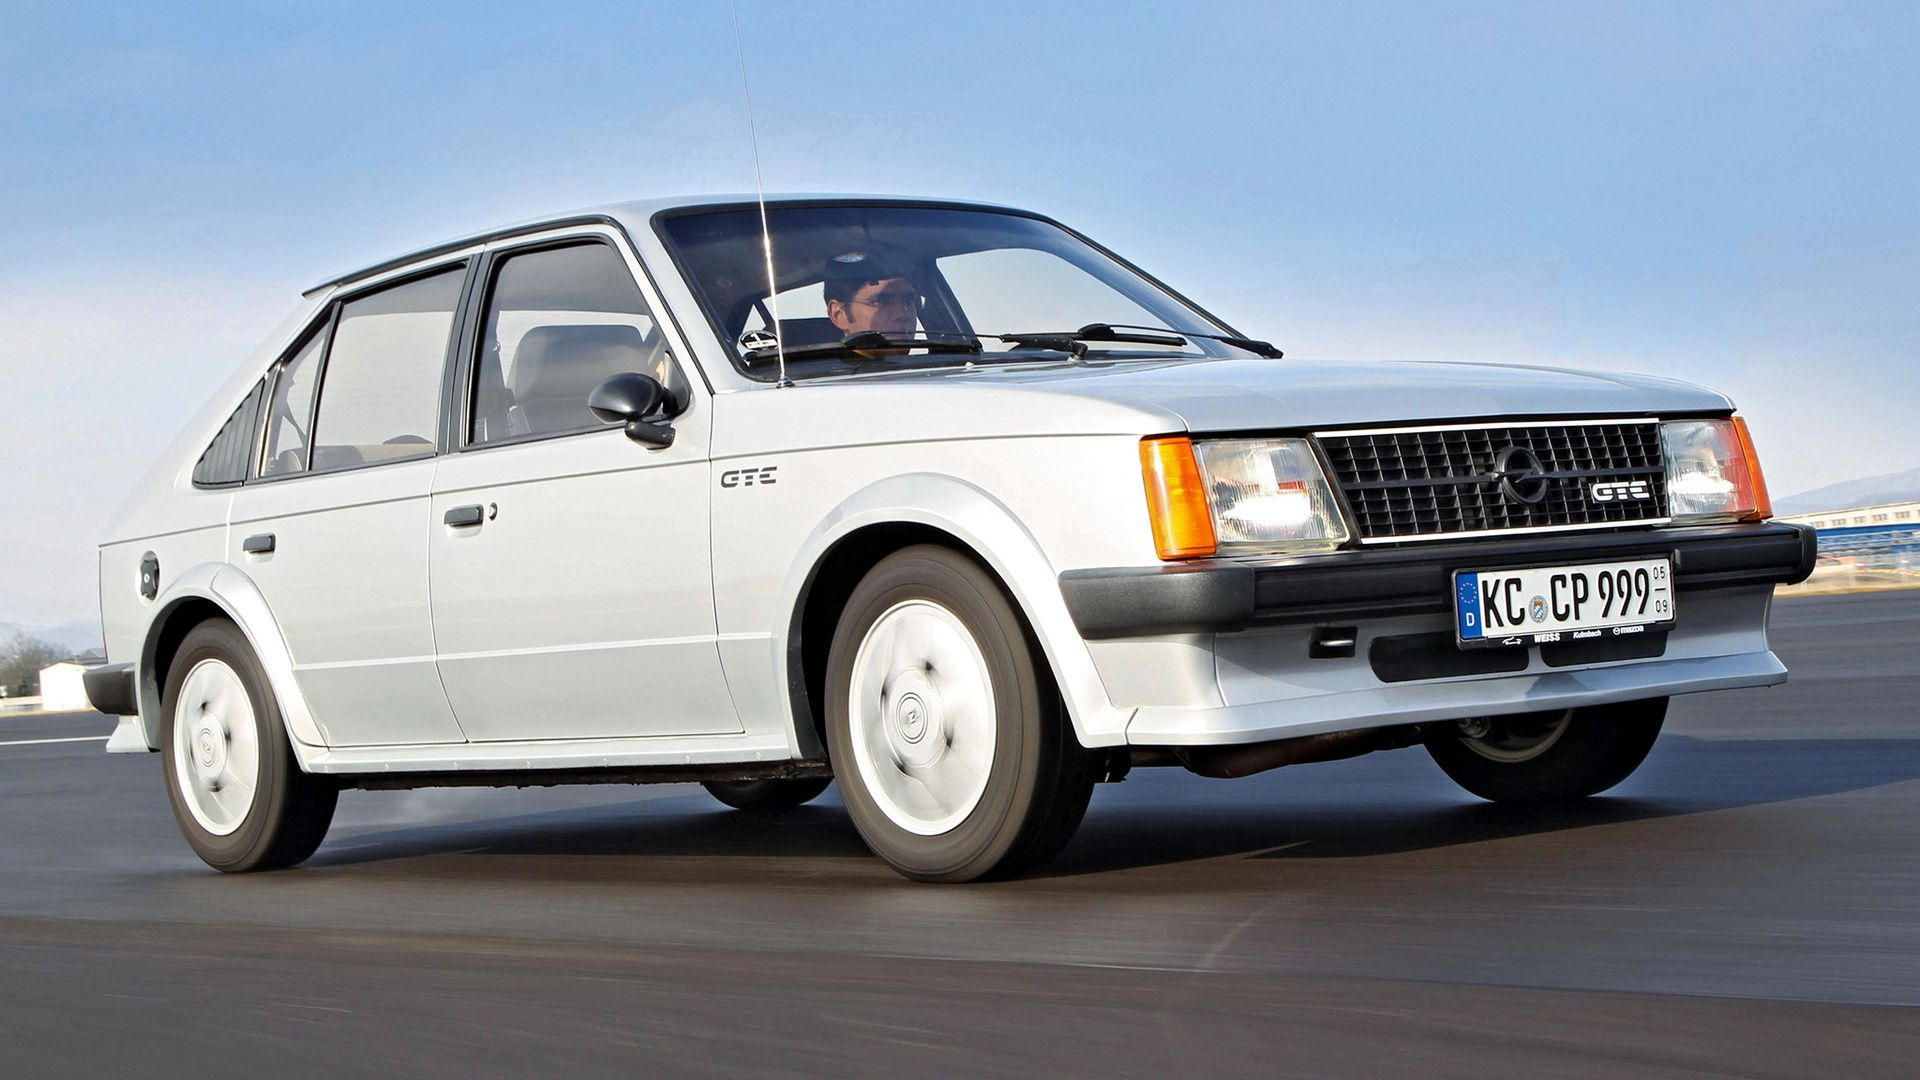 1983 opel kadett d gte classic cars pinterest cars. Black Bedroom Furniture Sets. Home Design Ideas